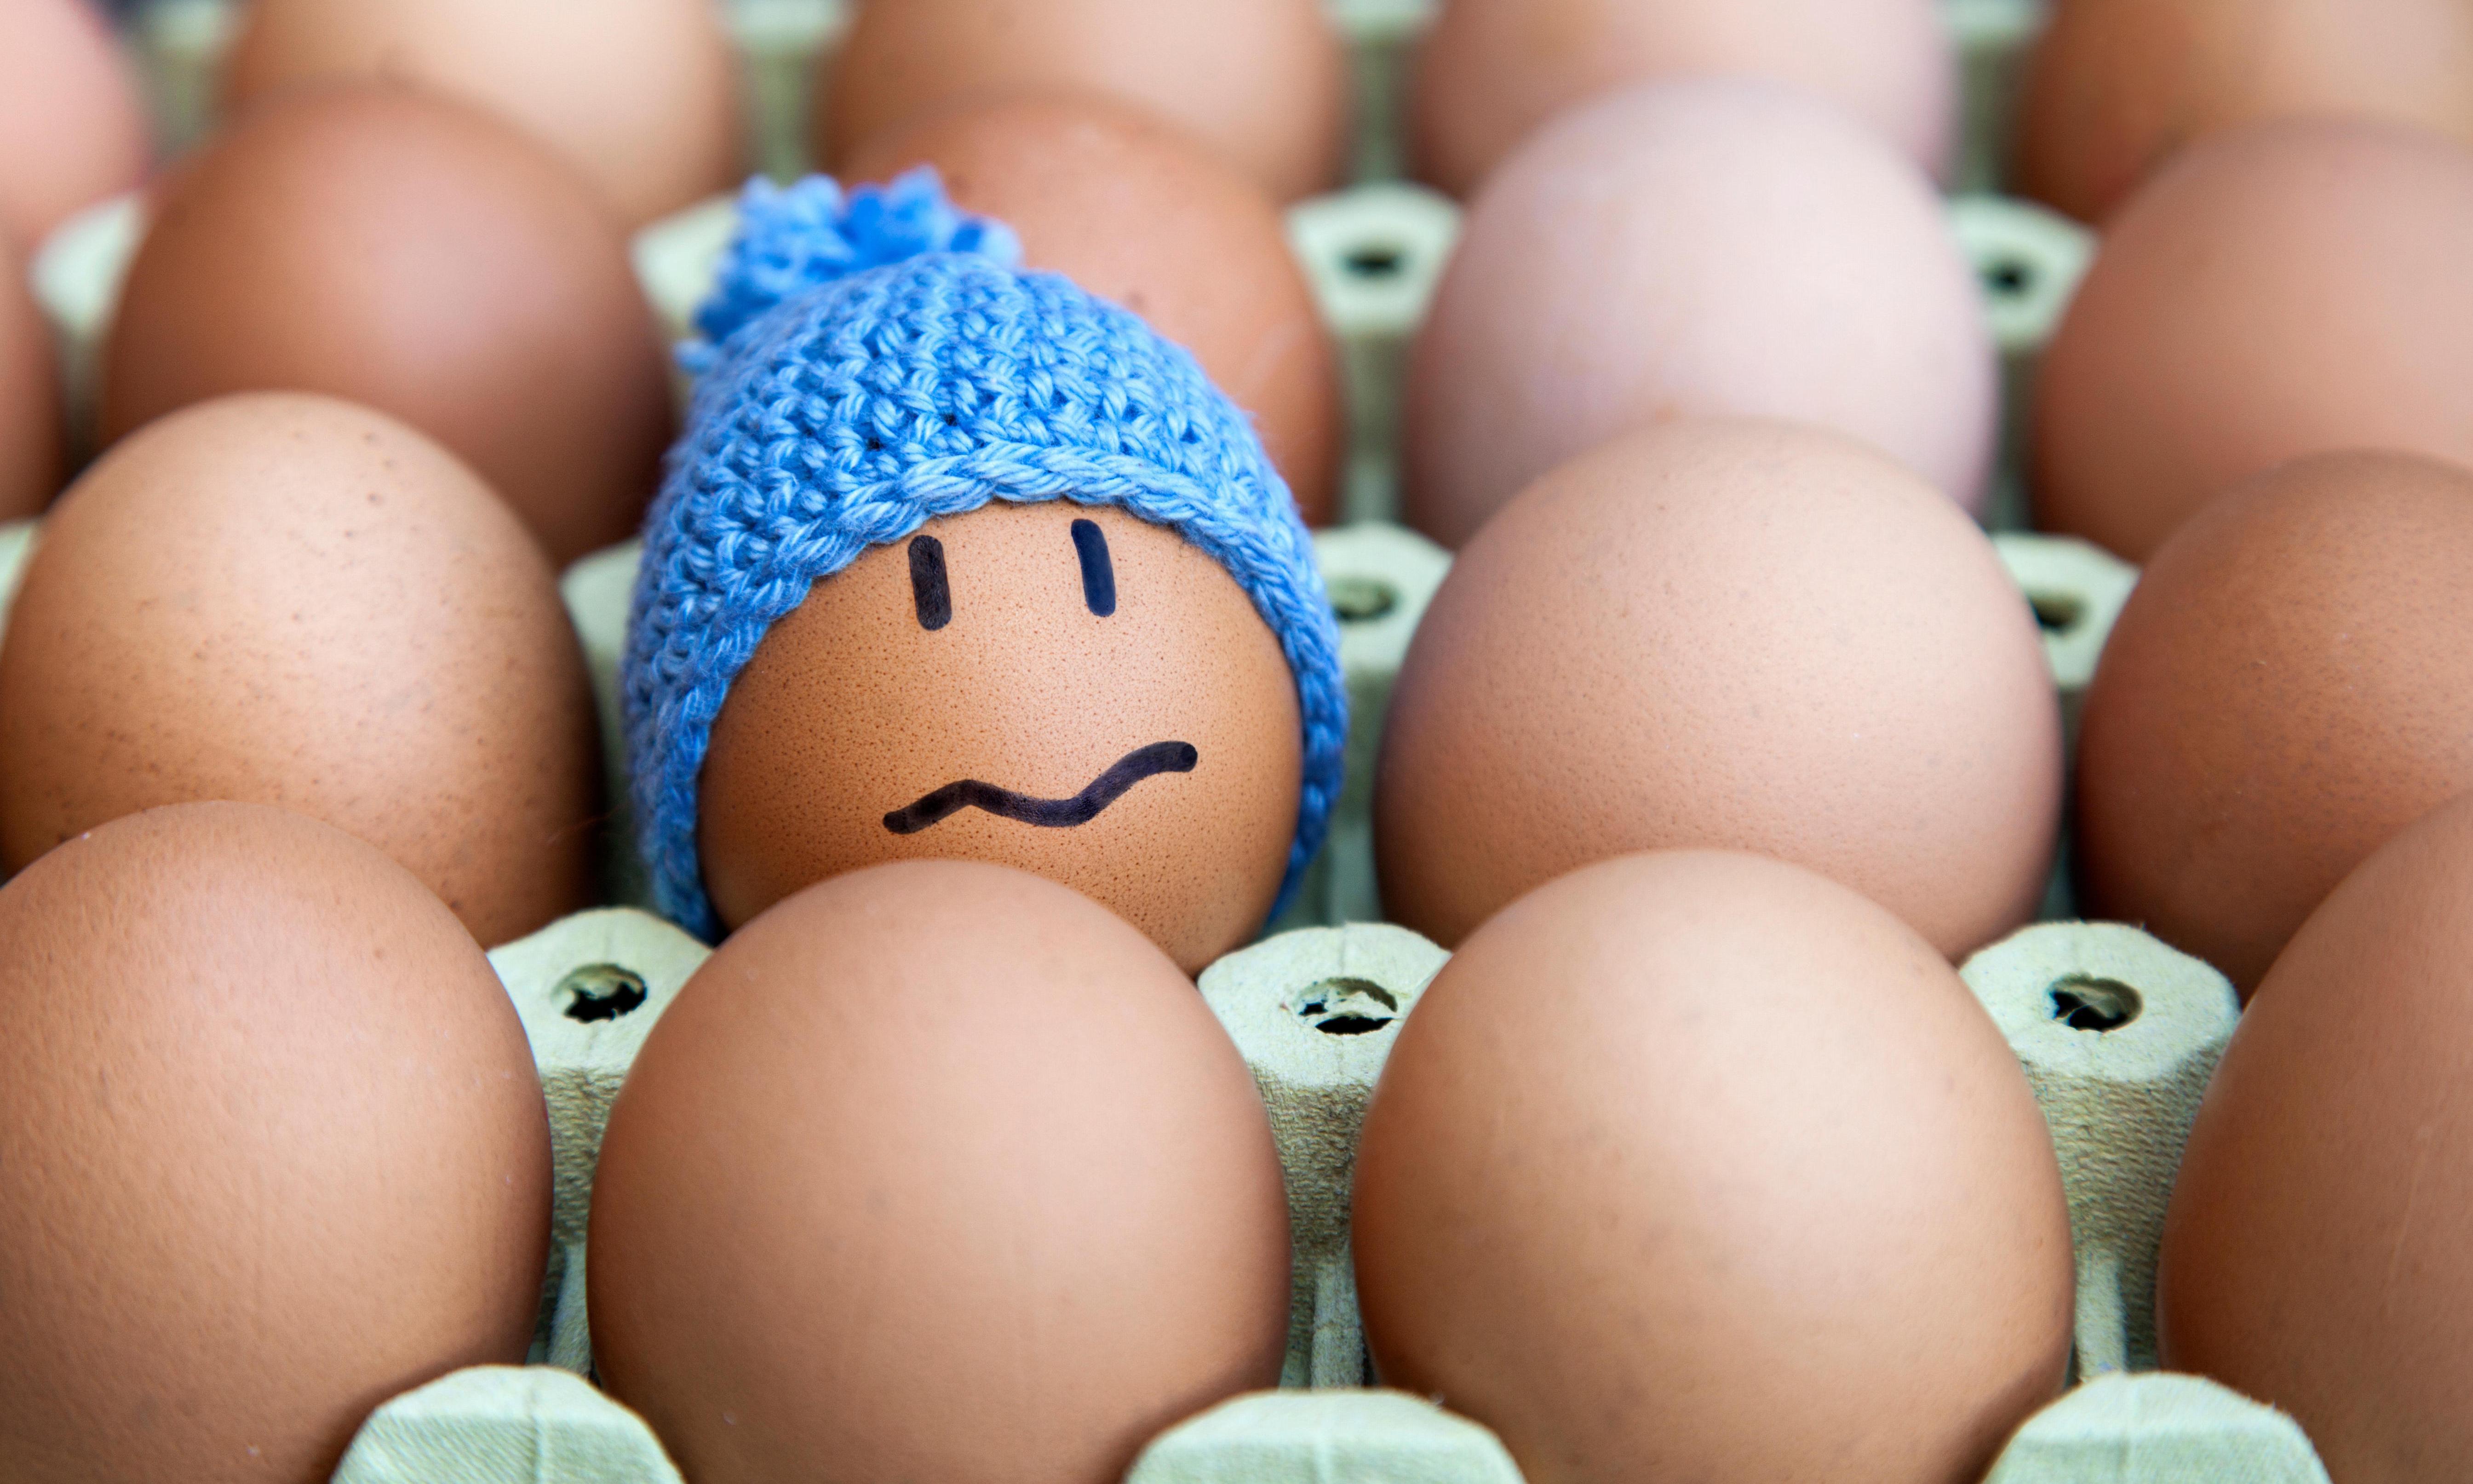 Seeking true happiness? Harness the power of negative thinking